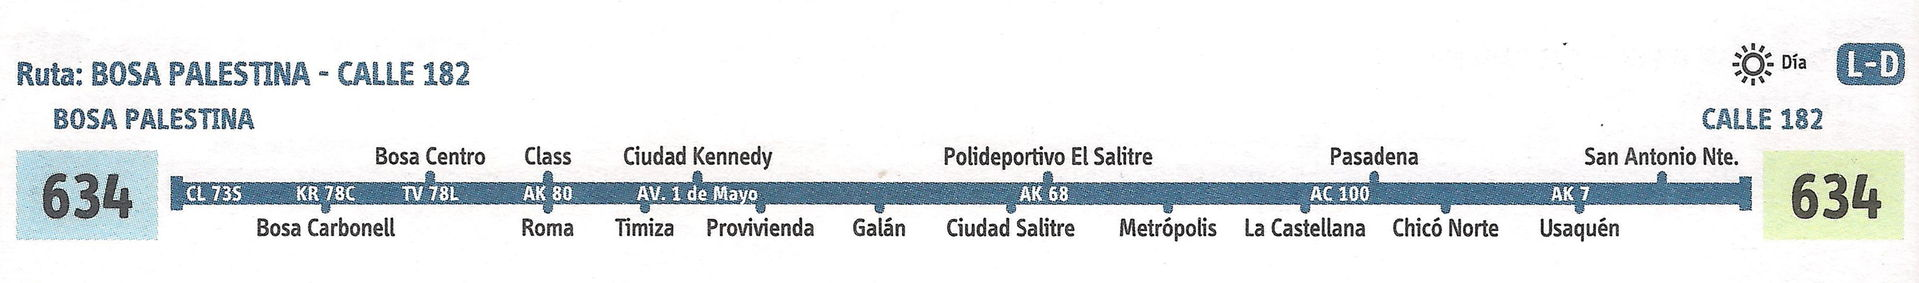 Ruta SITP: 634 Bosa Palestina ↔ Calle 183 [Urbana] 1